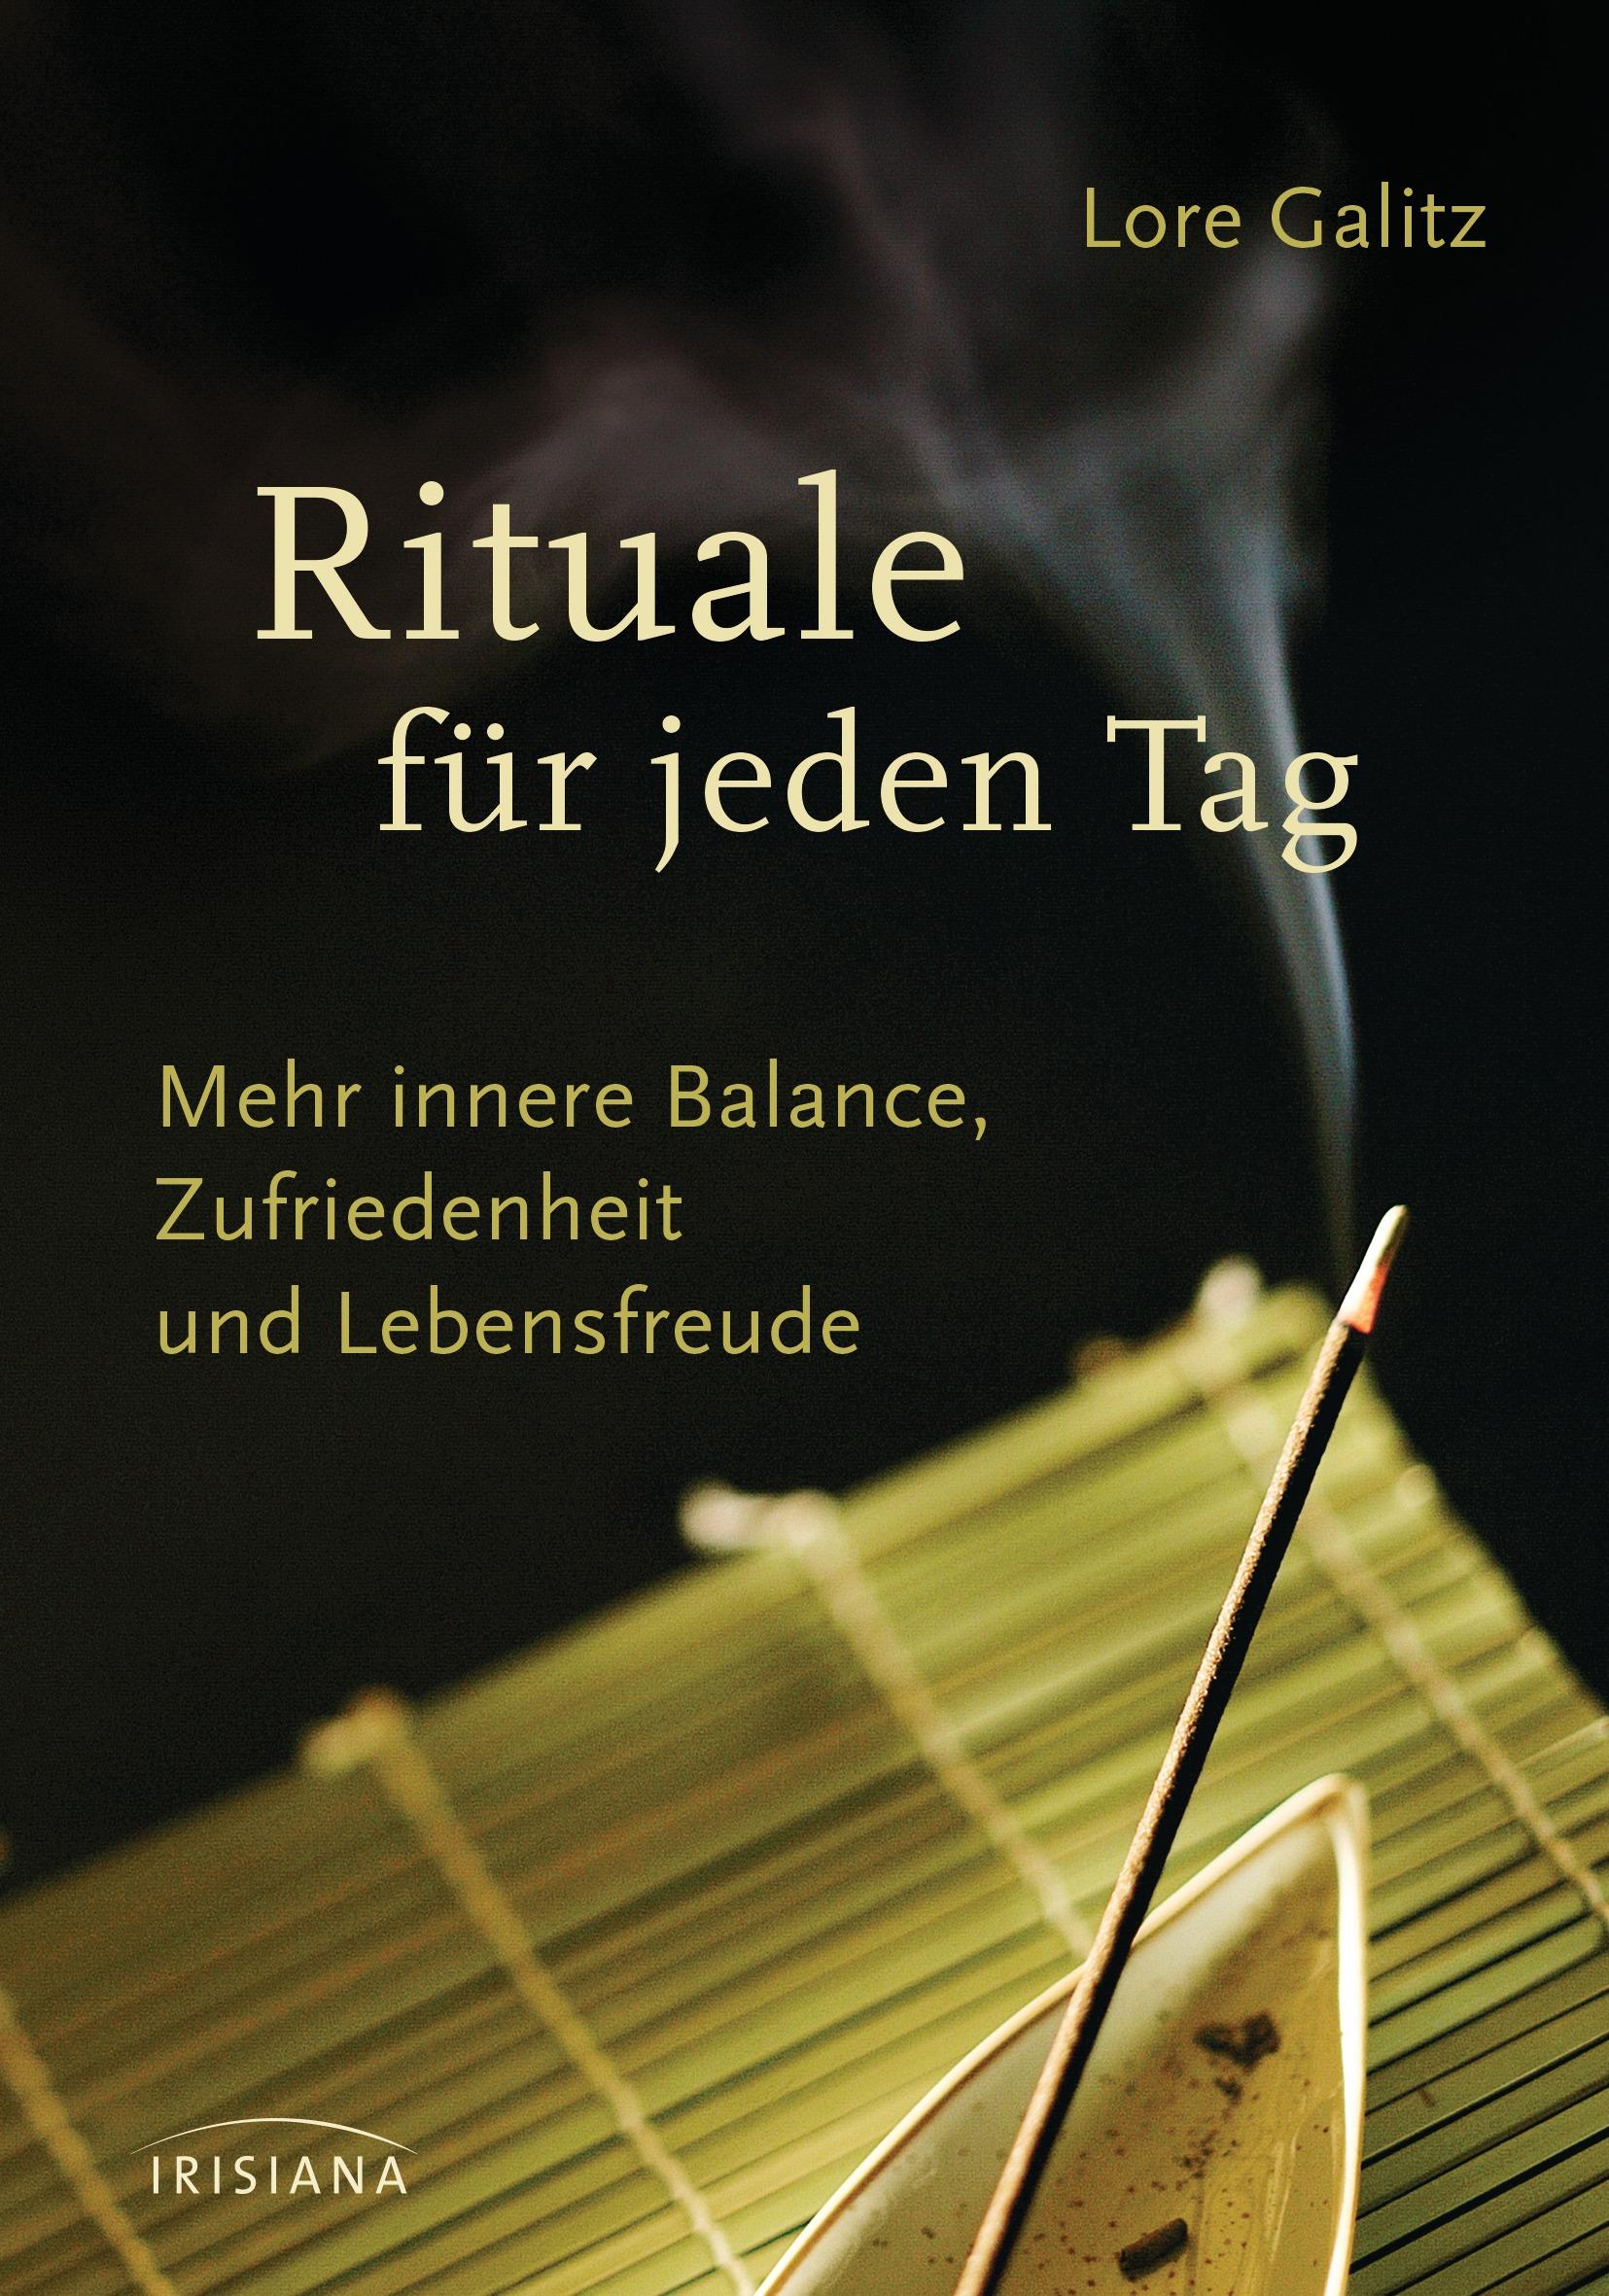 2015-10-27-1445957578-9233902-Galitz_LRituale_fuer_jeden_Tag_155892.jpg